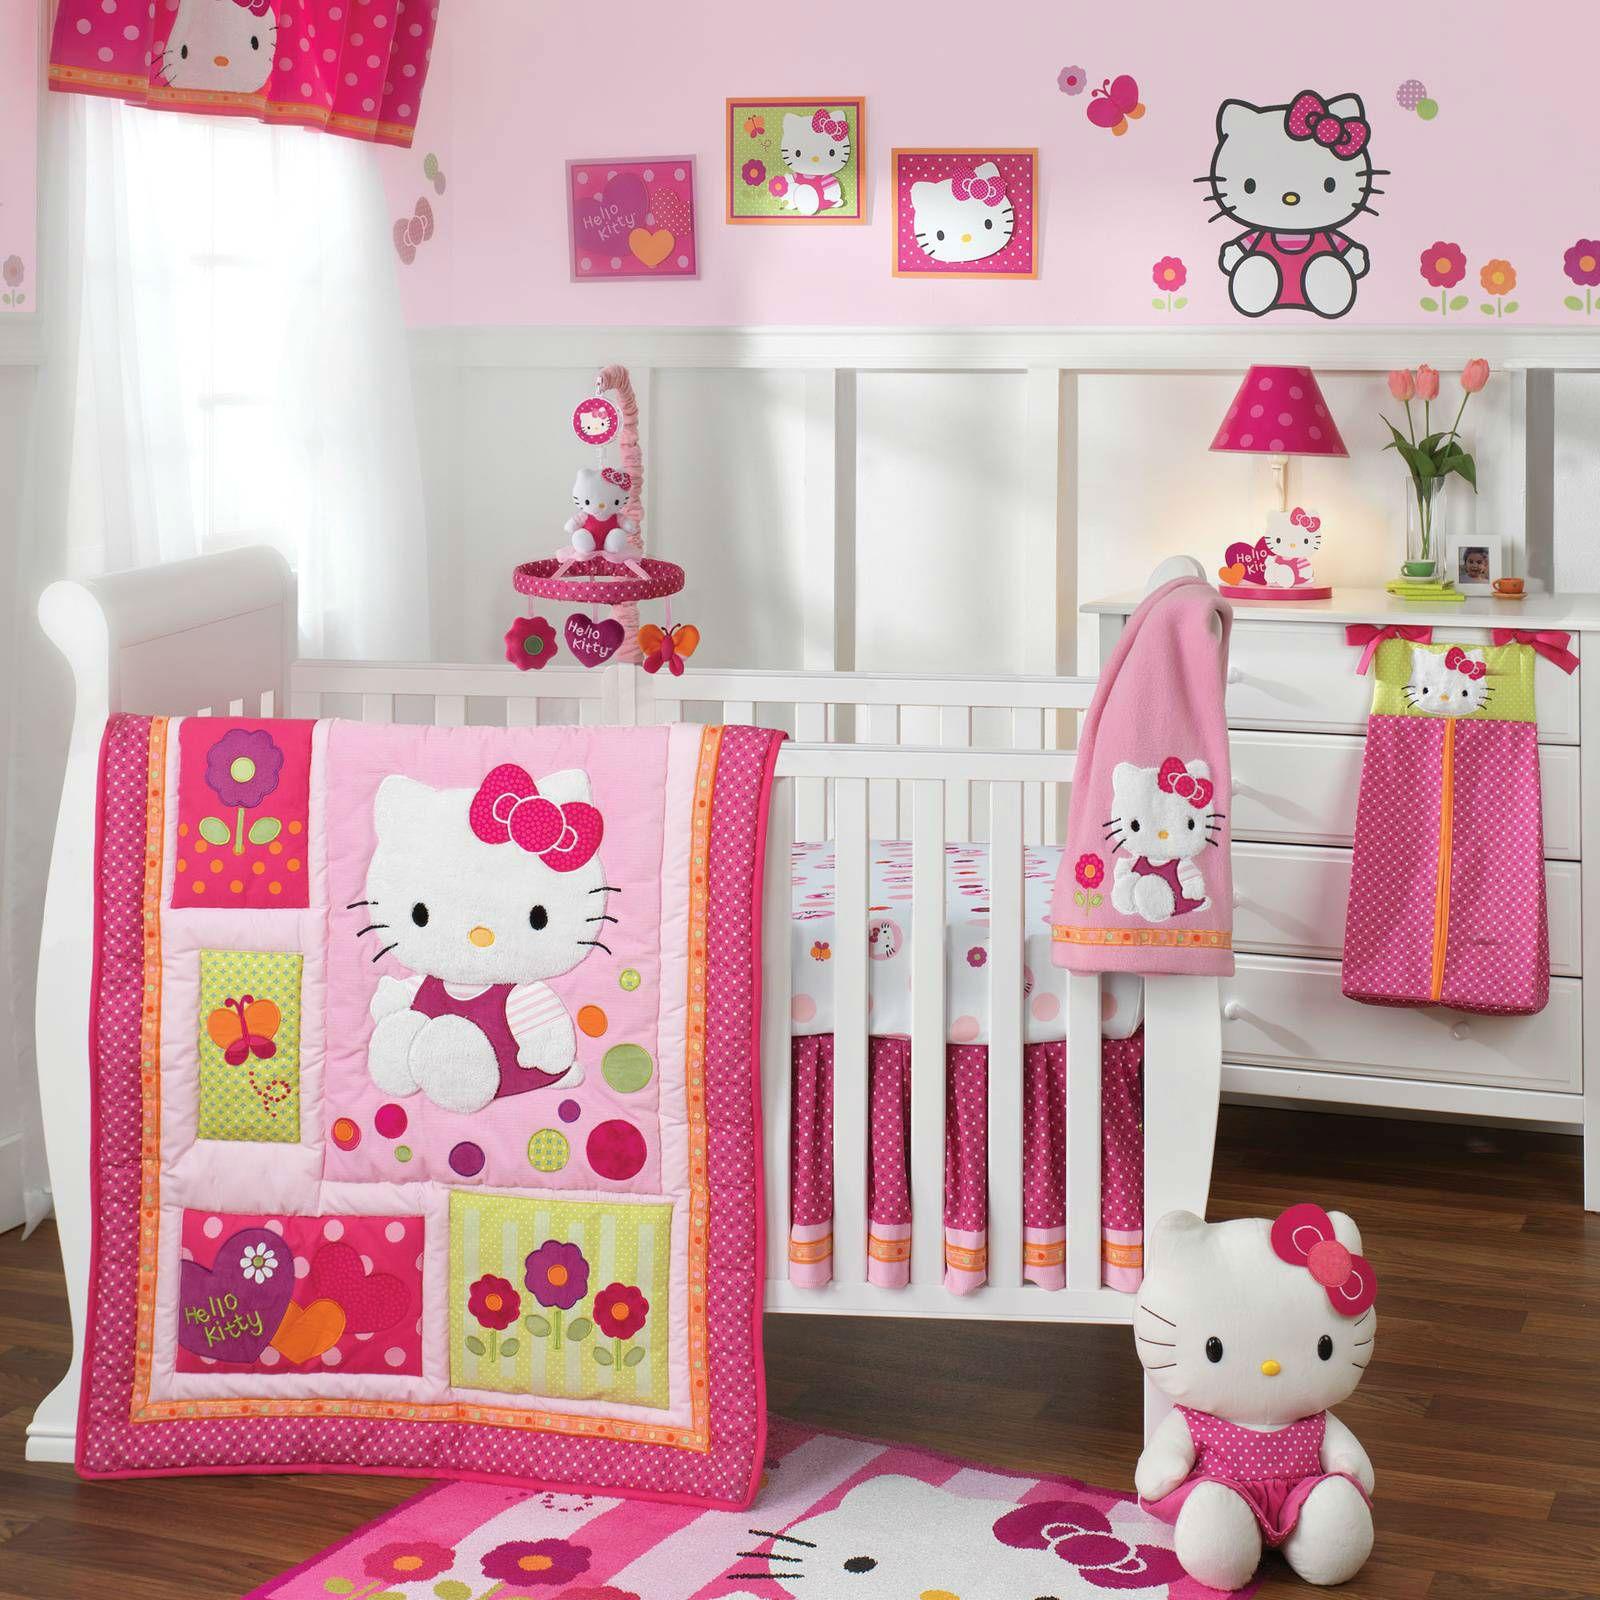 Ev dekorasyonunda Hello Kitty modası